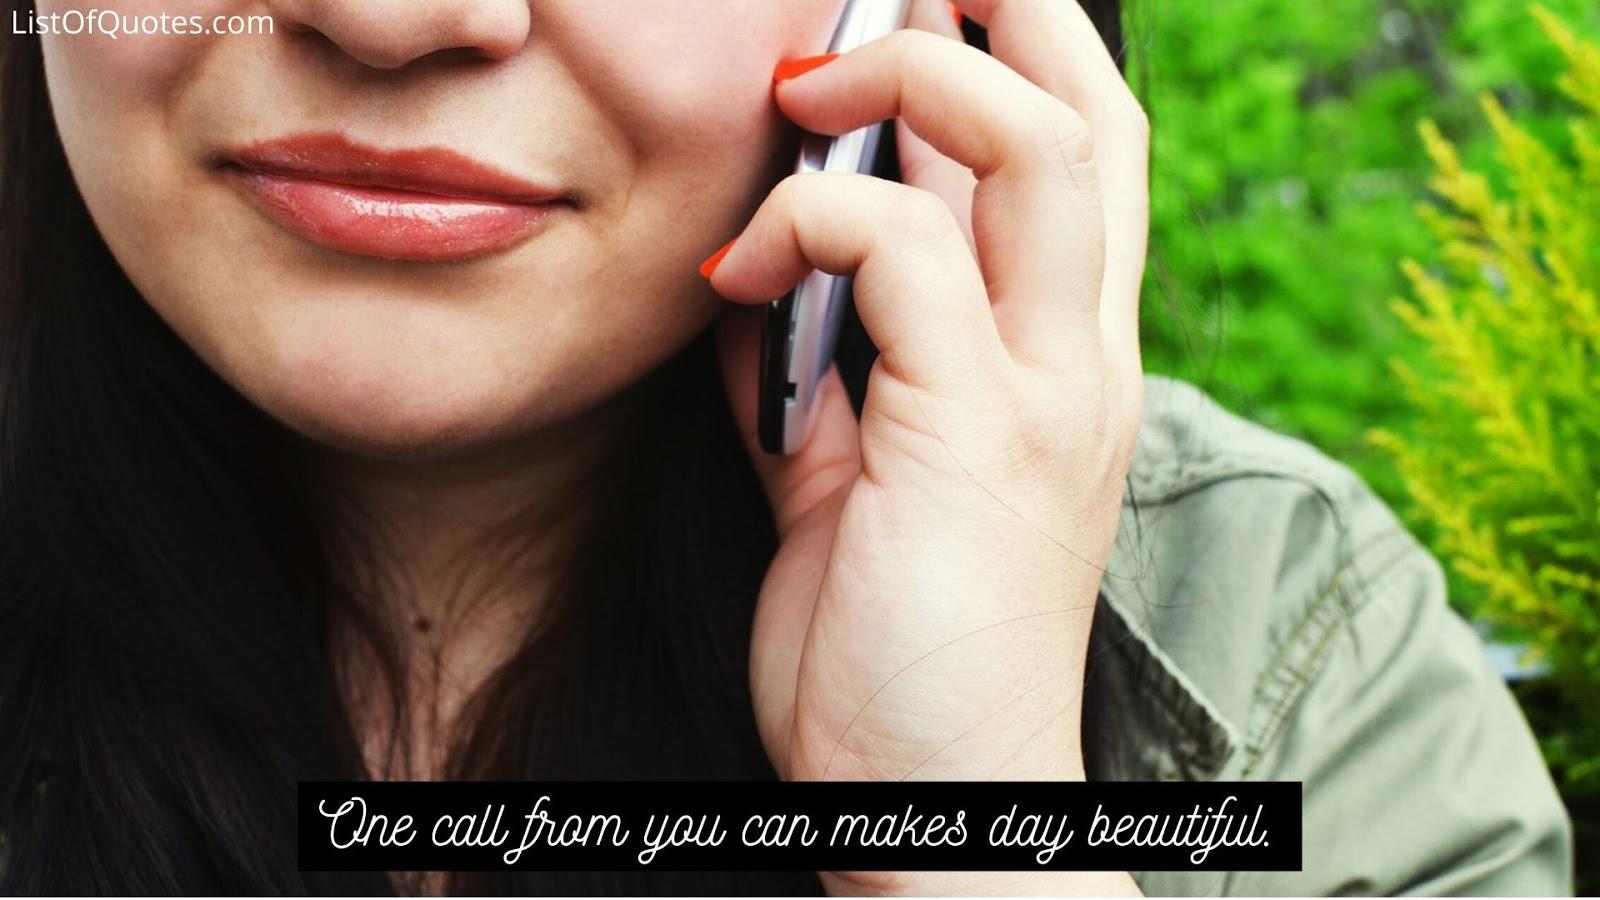 surviving long distance relationship quotes For Boyfriend Girlfriend